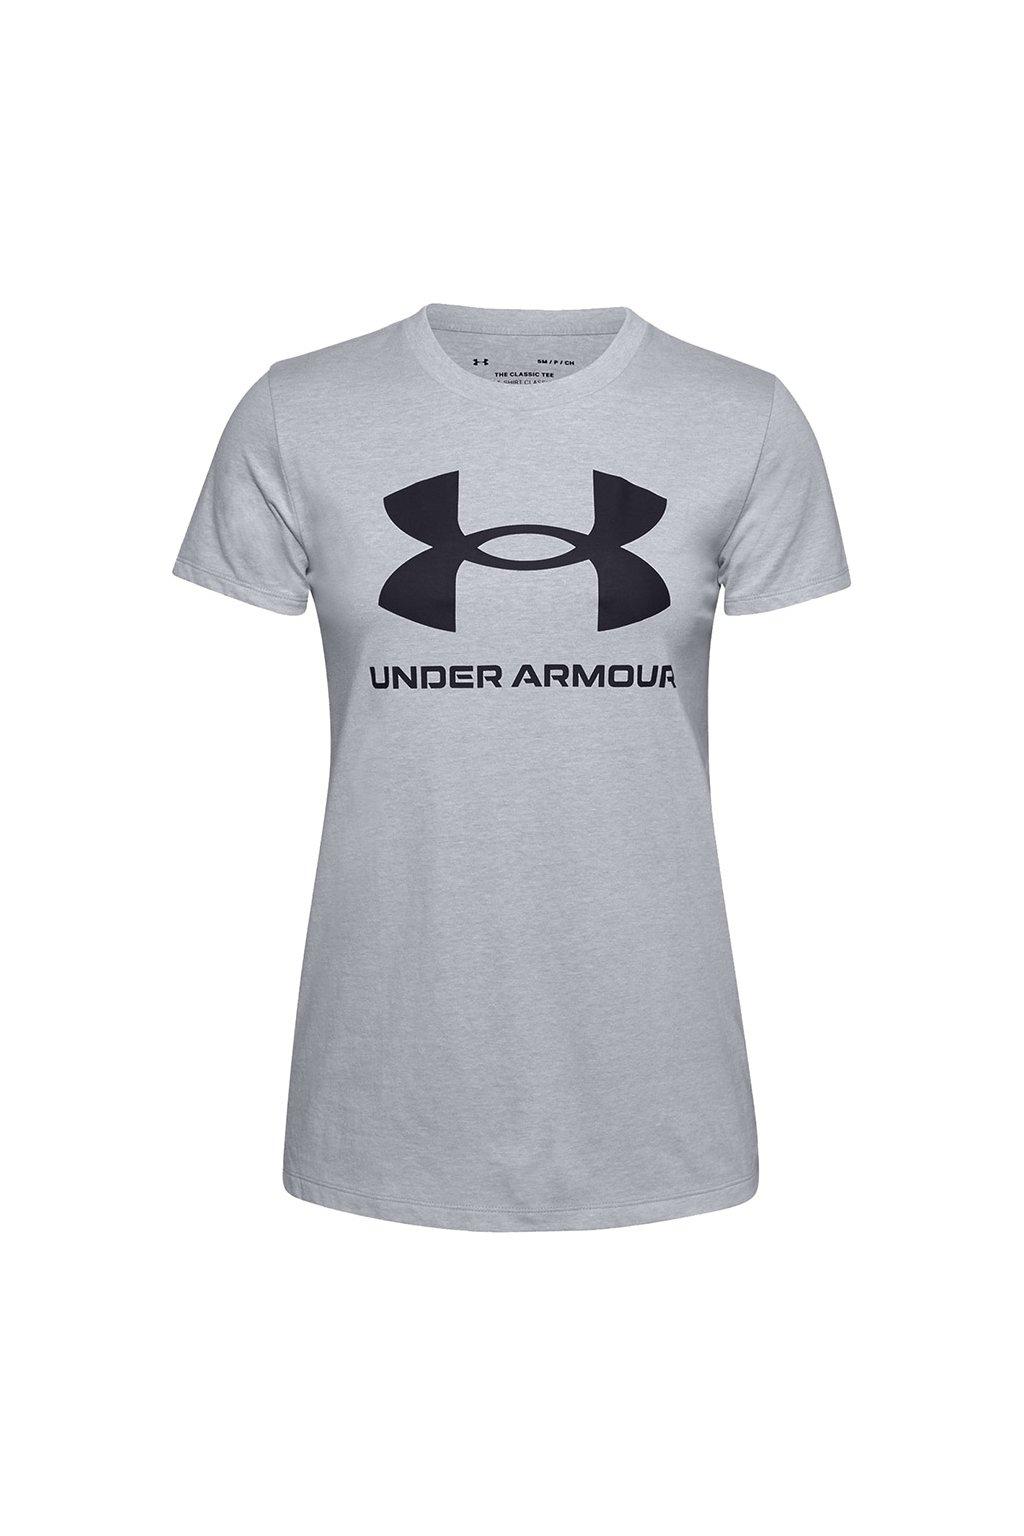 Dámske tričko Under Armour Live Sportstyle Graphic Ssc svetlo sivá 1356305 011